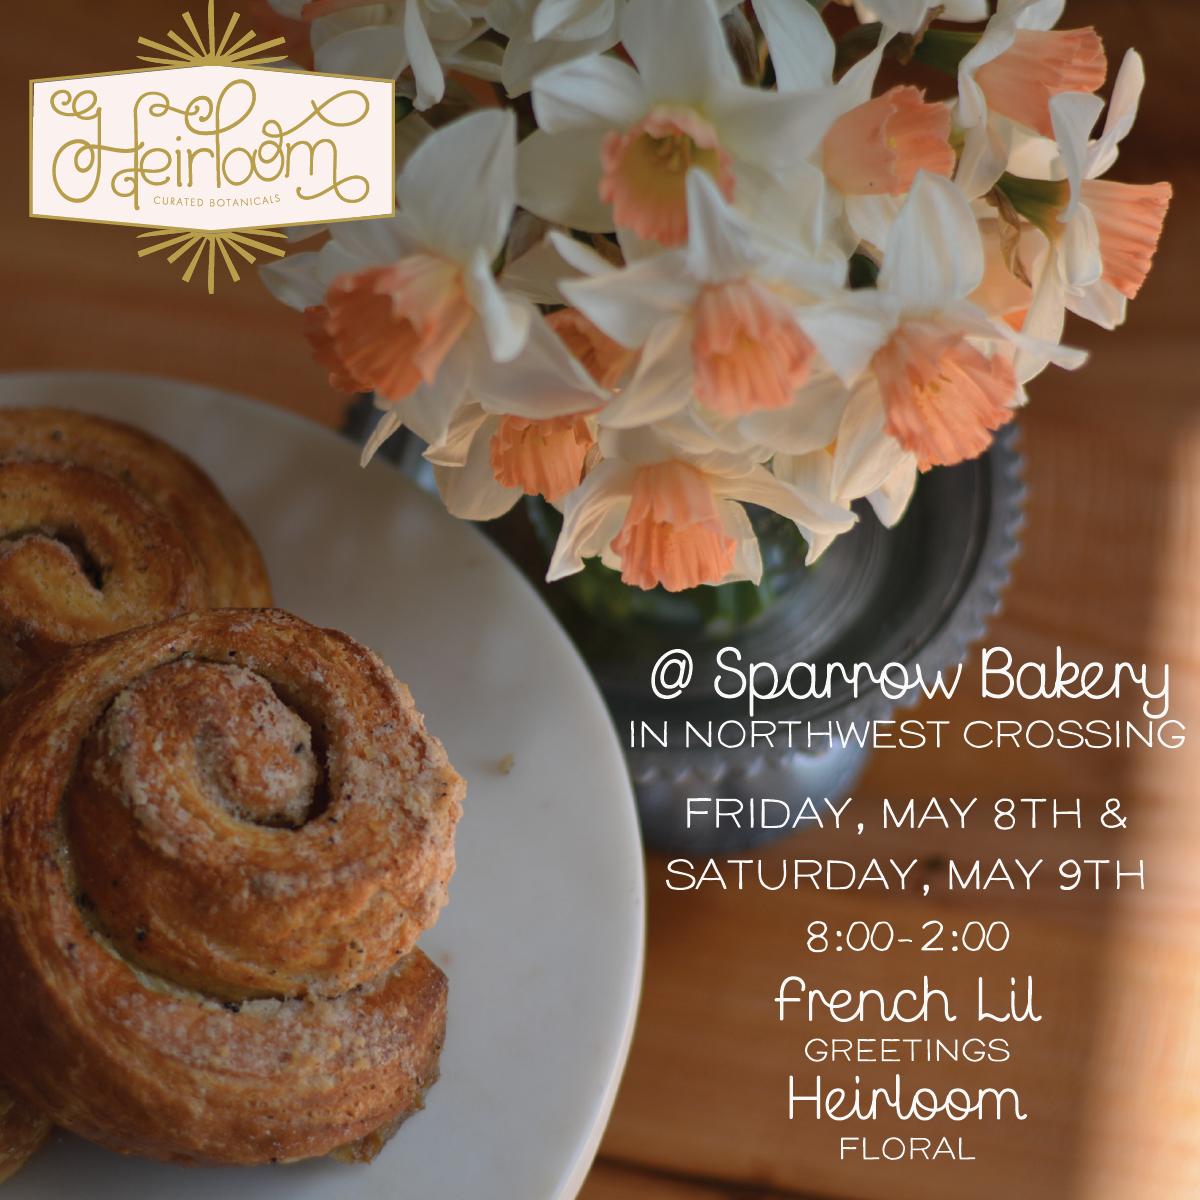 heirloom_floral_sparrow_mother'sday_bend oregon.png